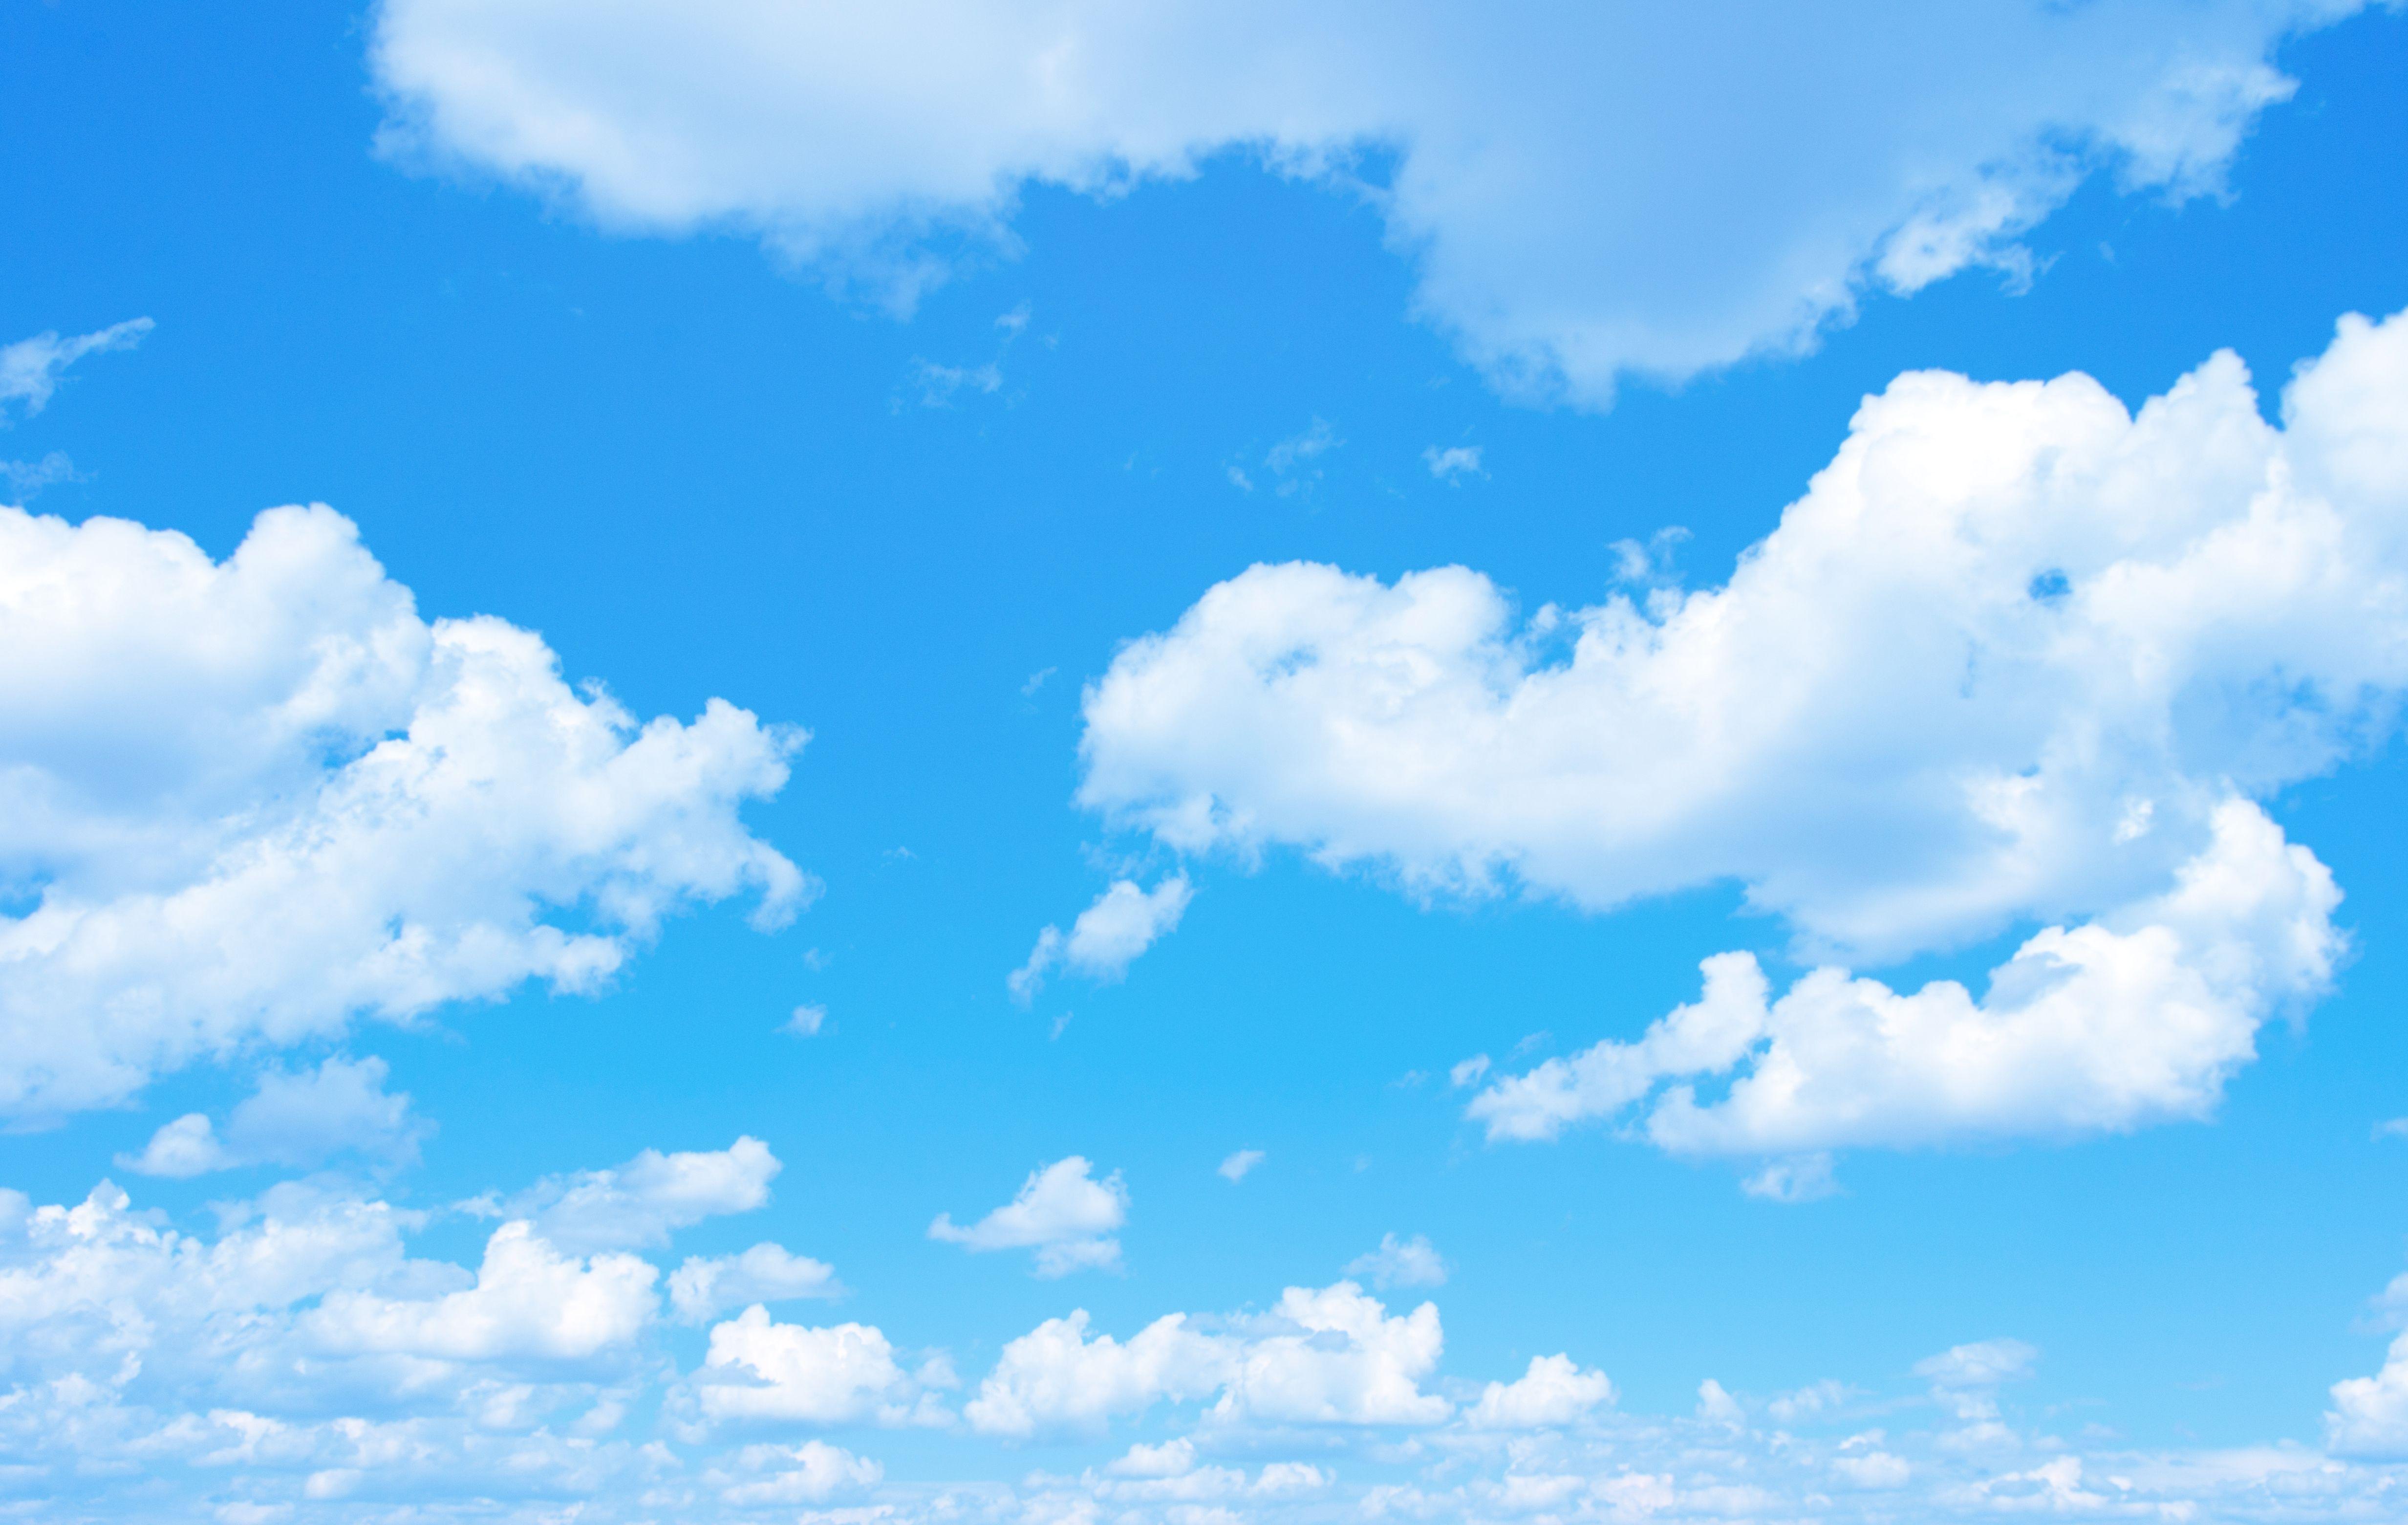 High Res Blue Sky Wallpapers 982074 Pictures feelgrafixcom